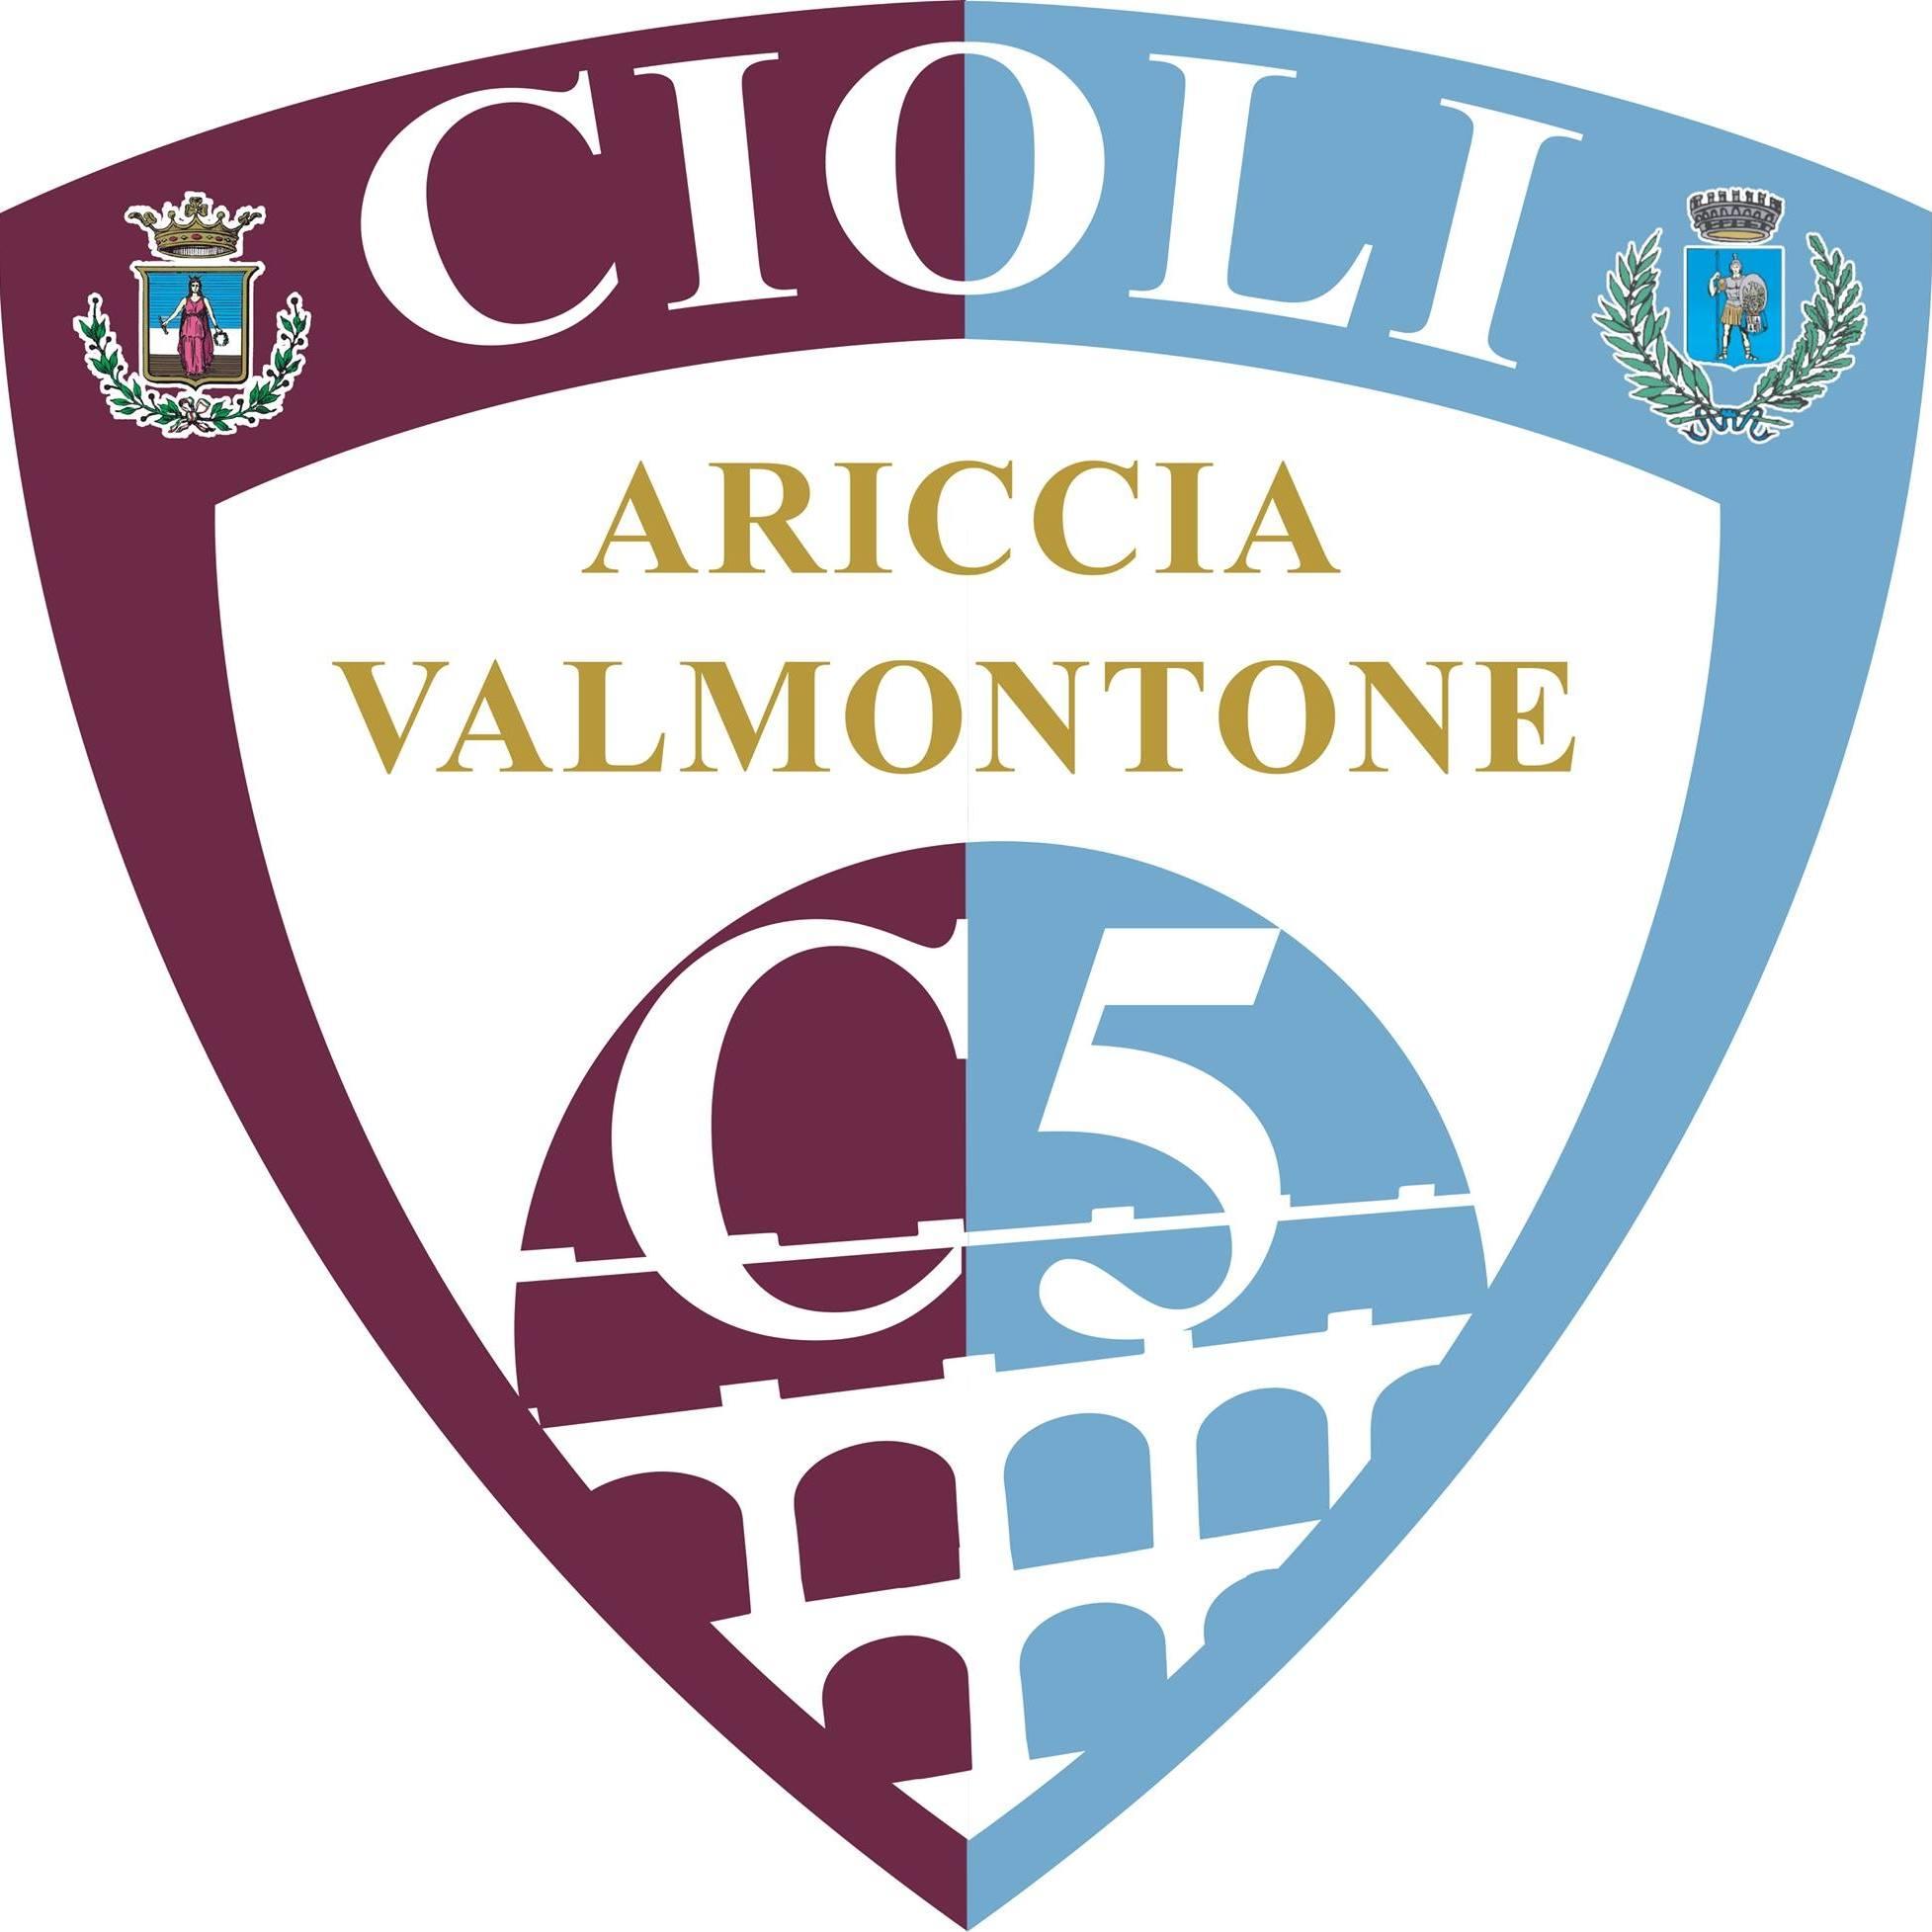 CIOLI ARICCIA VALMONTONE